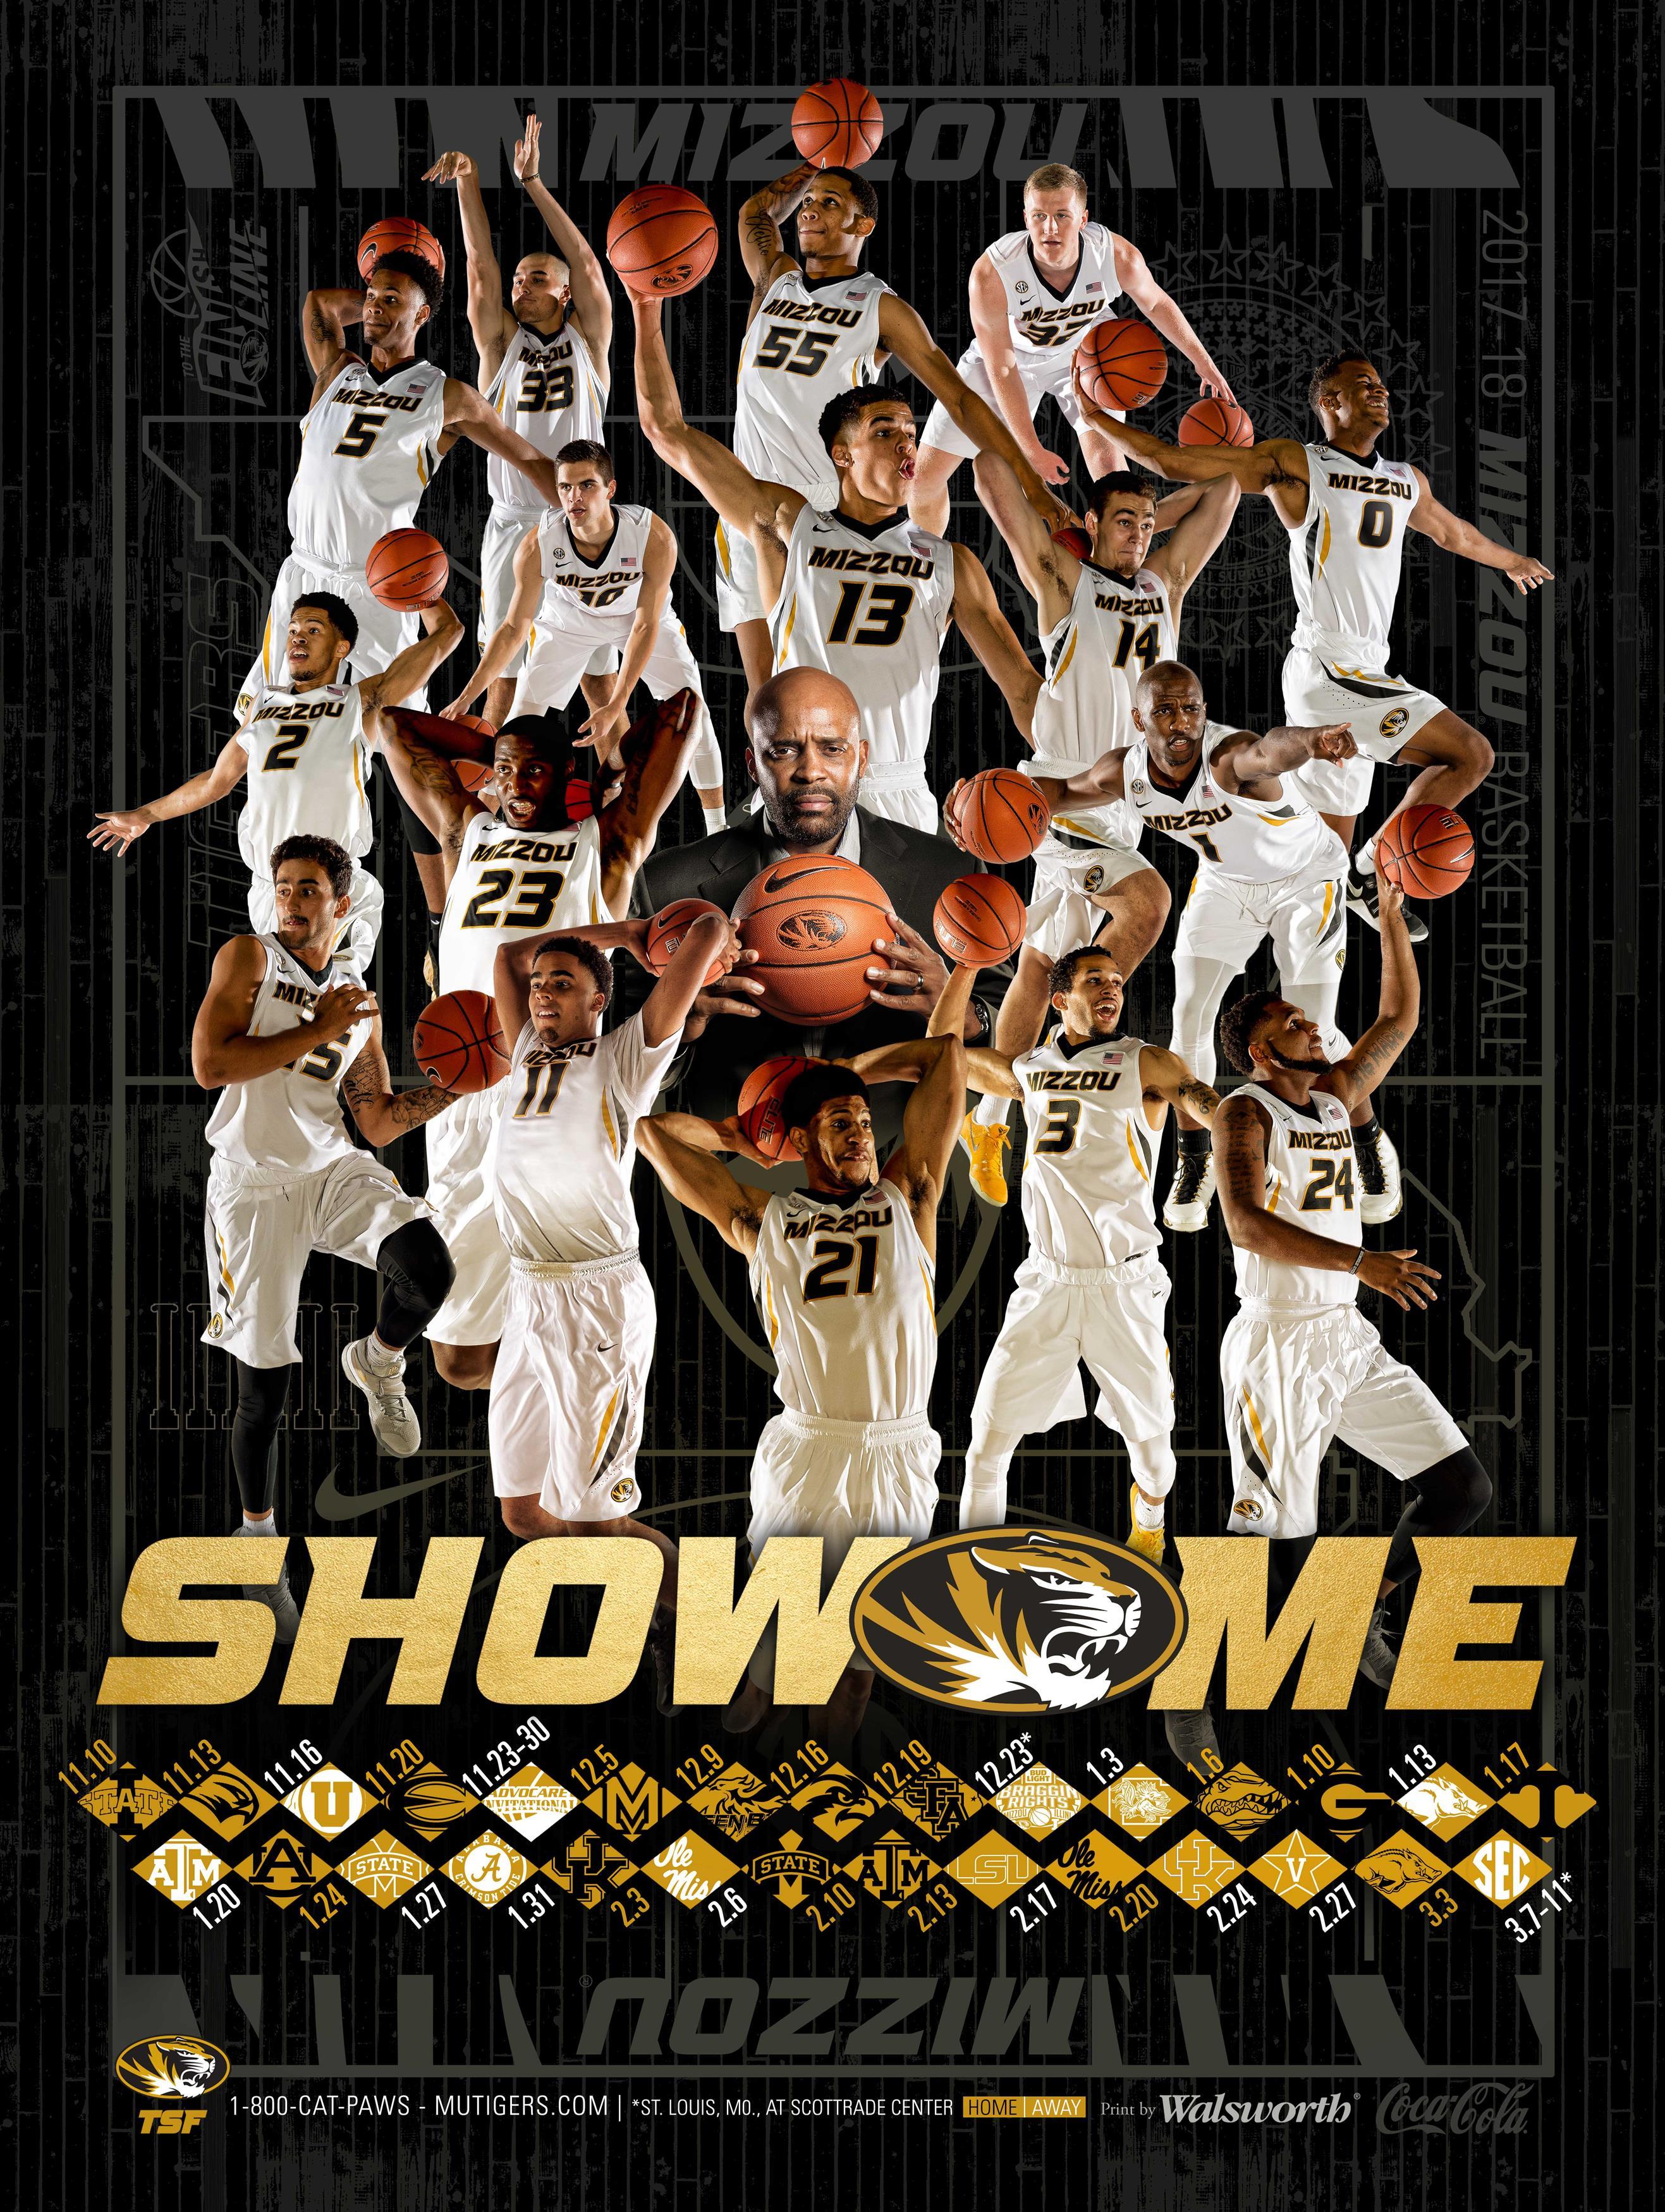 mizzou basketball wallpapers